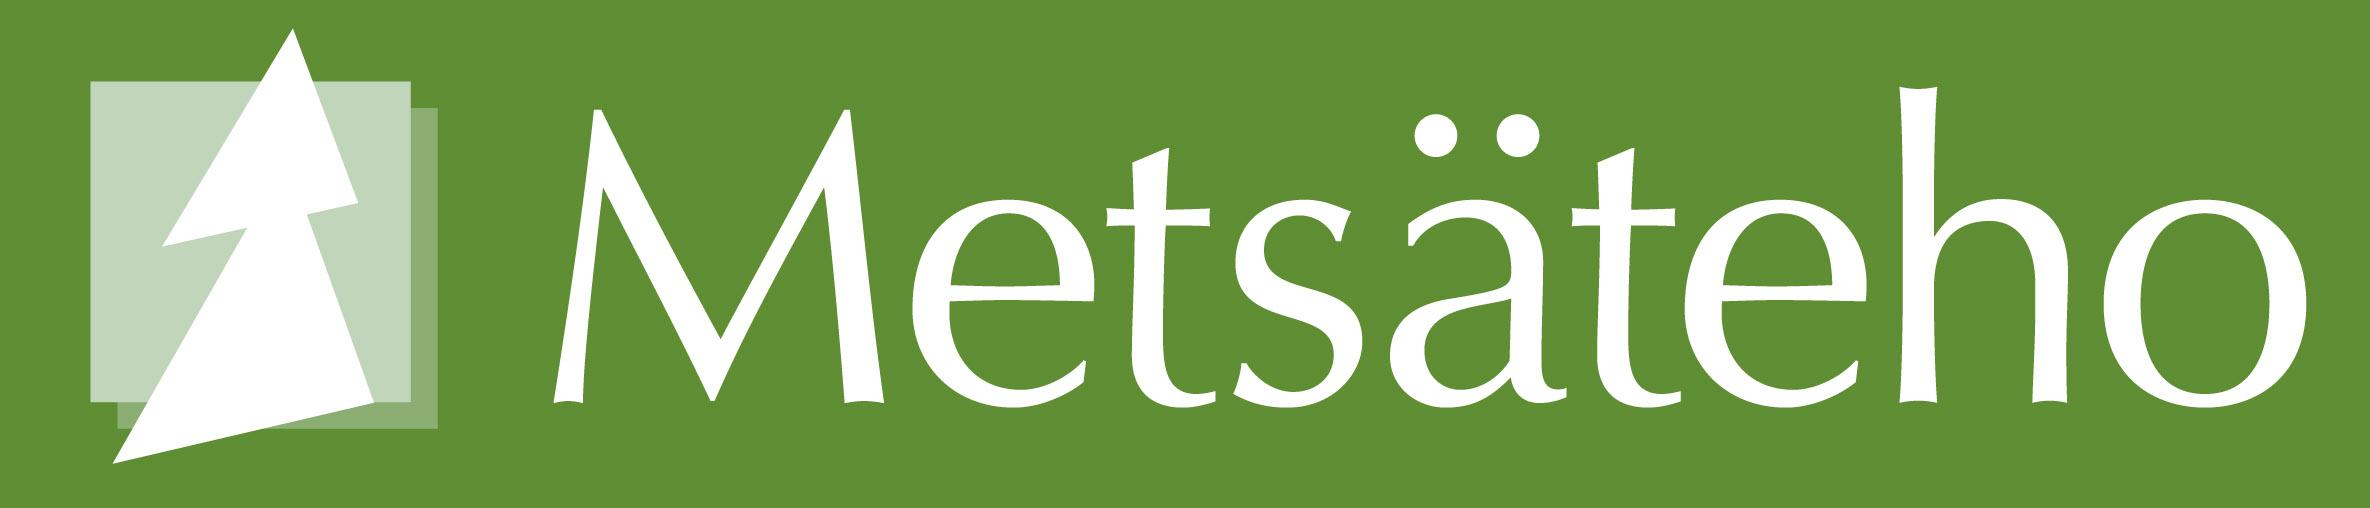 Metsatehon logo (RGB nega vihreäpohjainen, 2225x442)